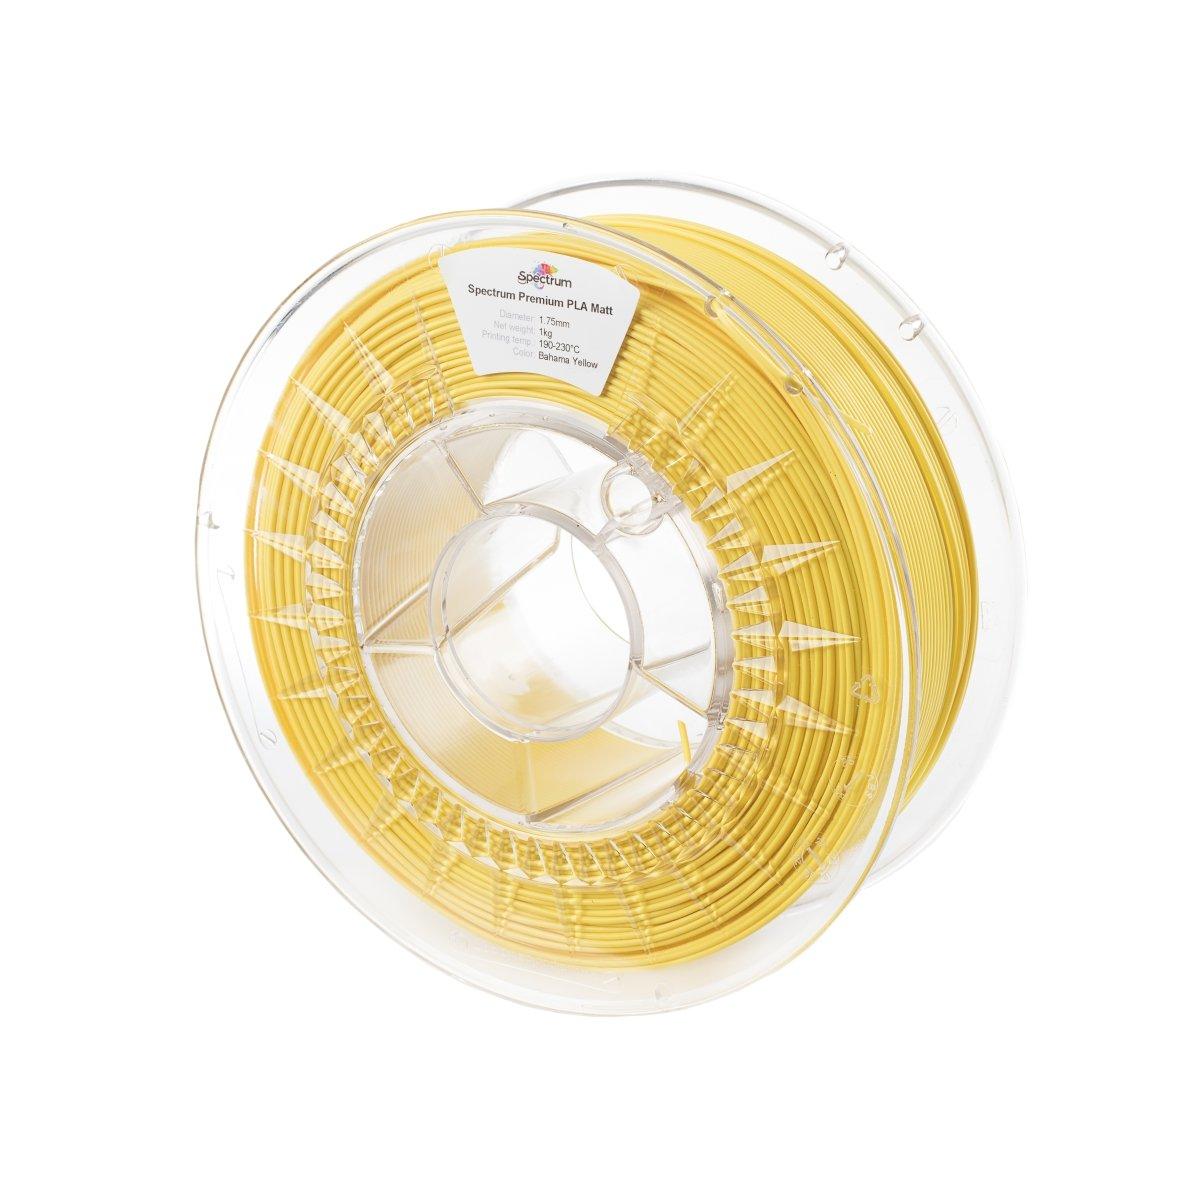 Billede af Spectrum Filaments - PLA Matt - 1.75mm - Bahama Yellow - 1 kg